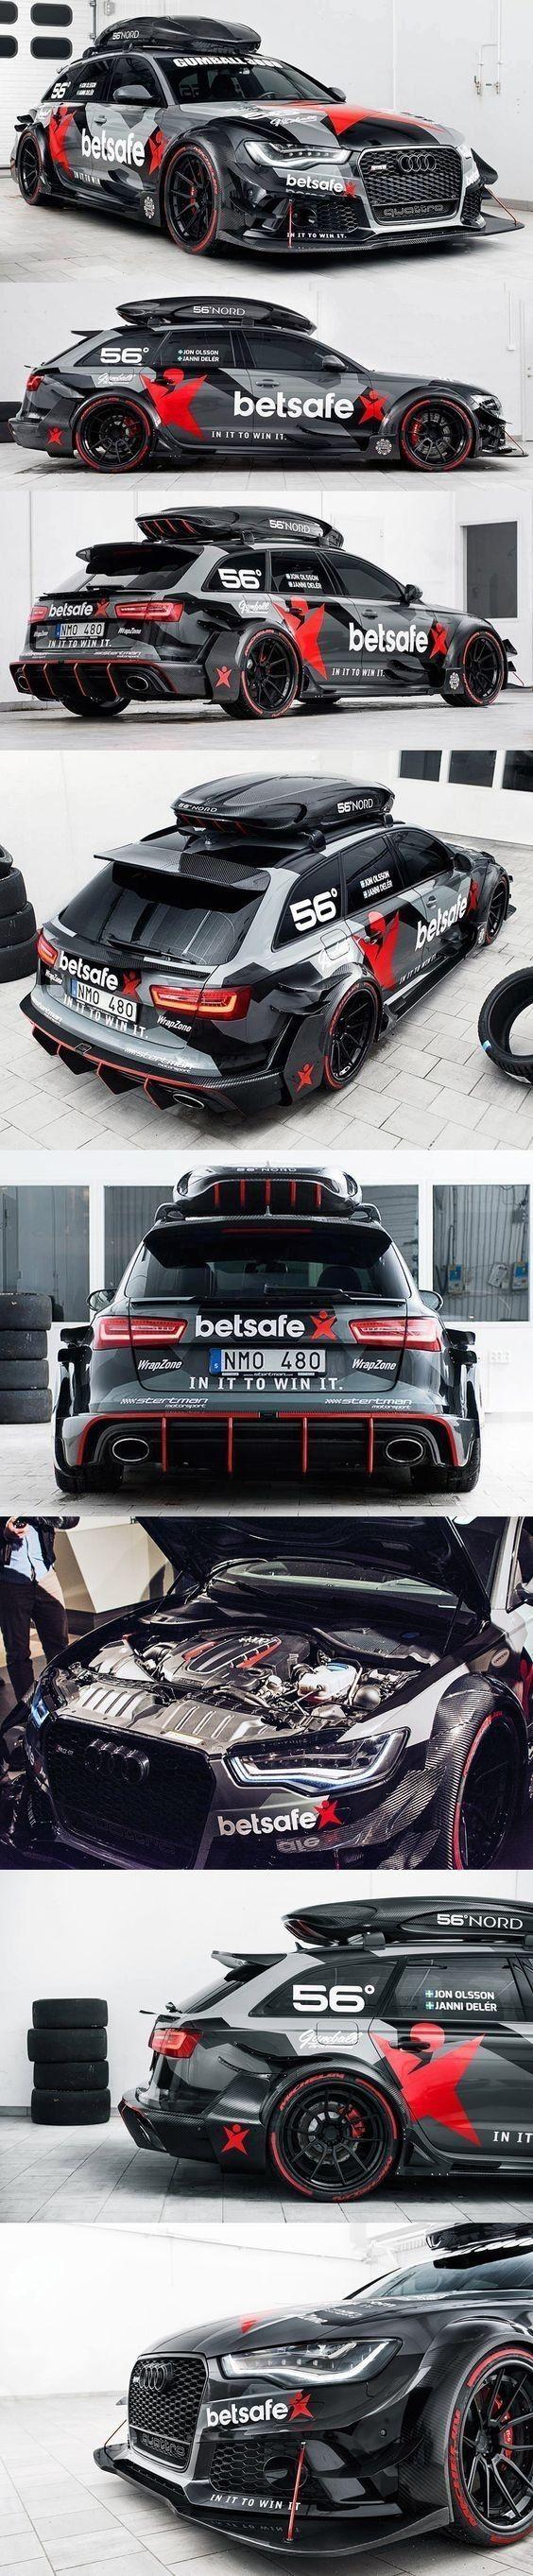 AUDI Quattro RS Hyper Sport Car   Autos